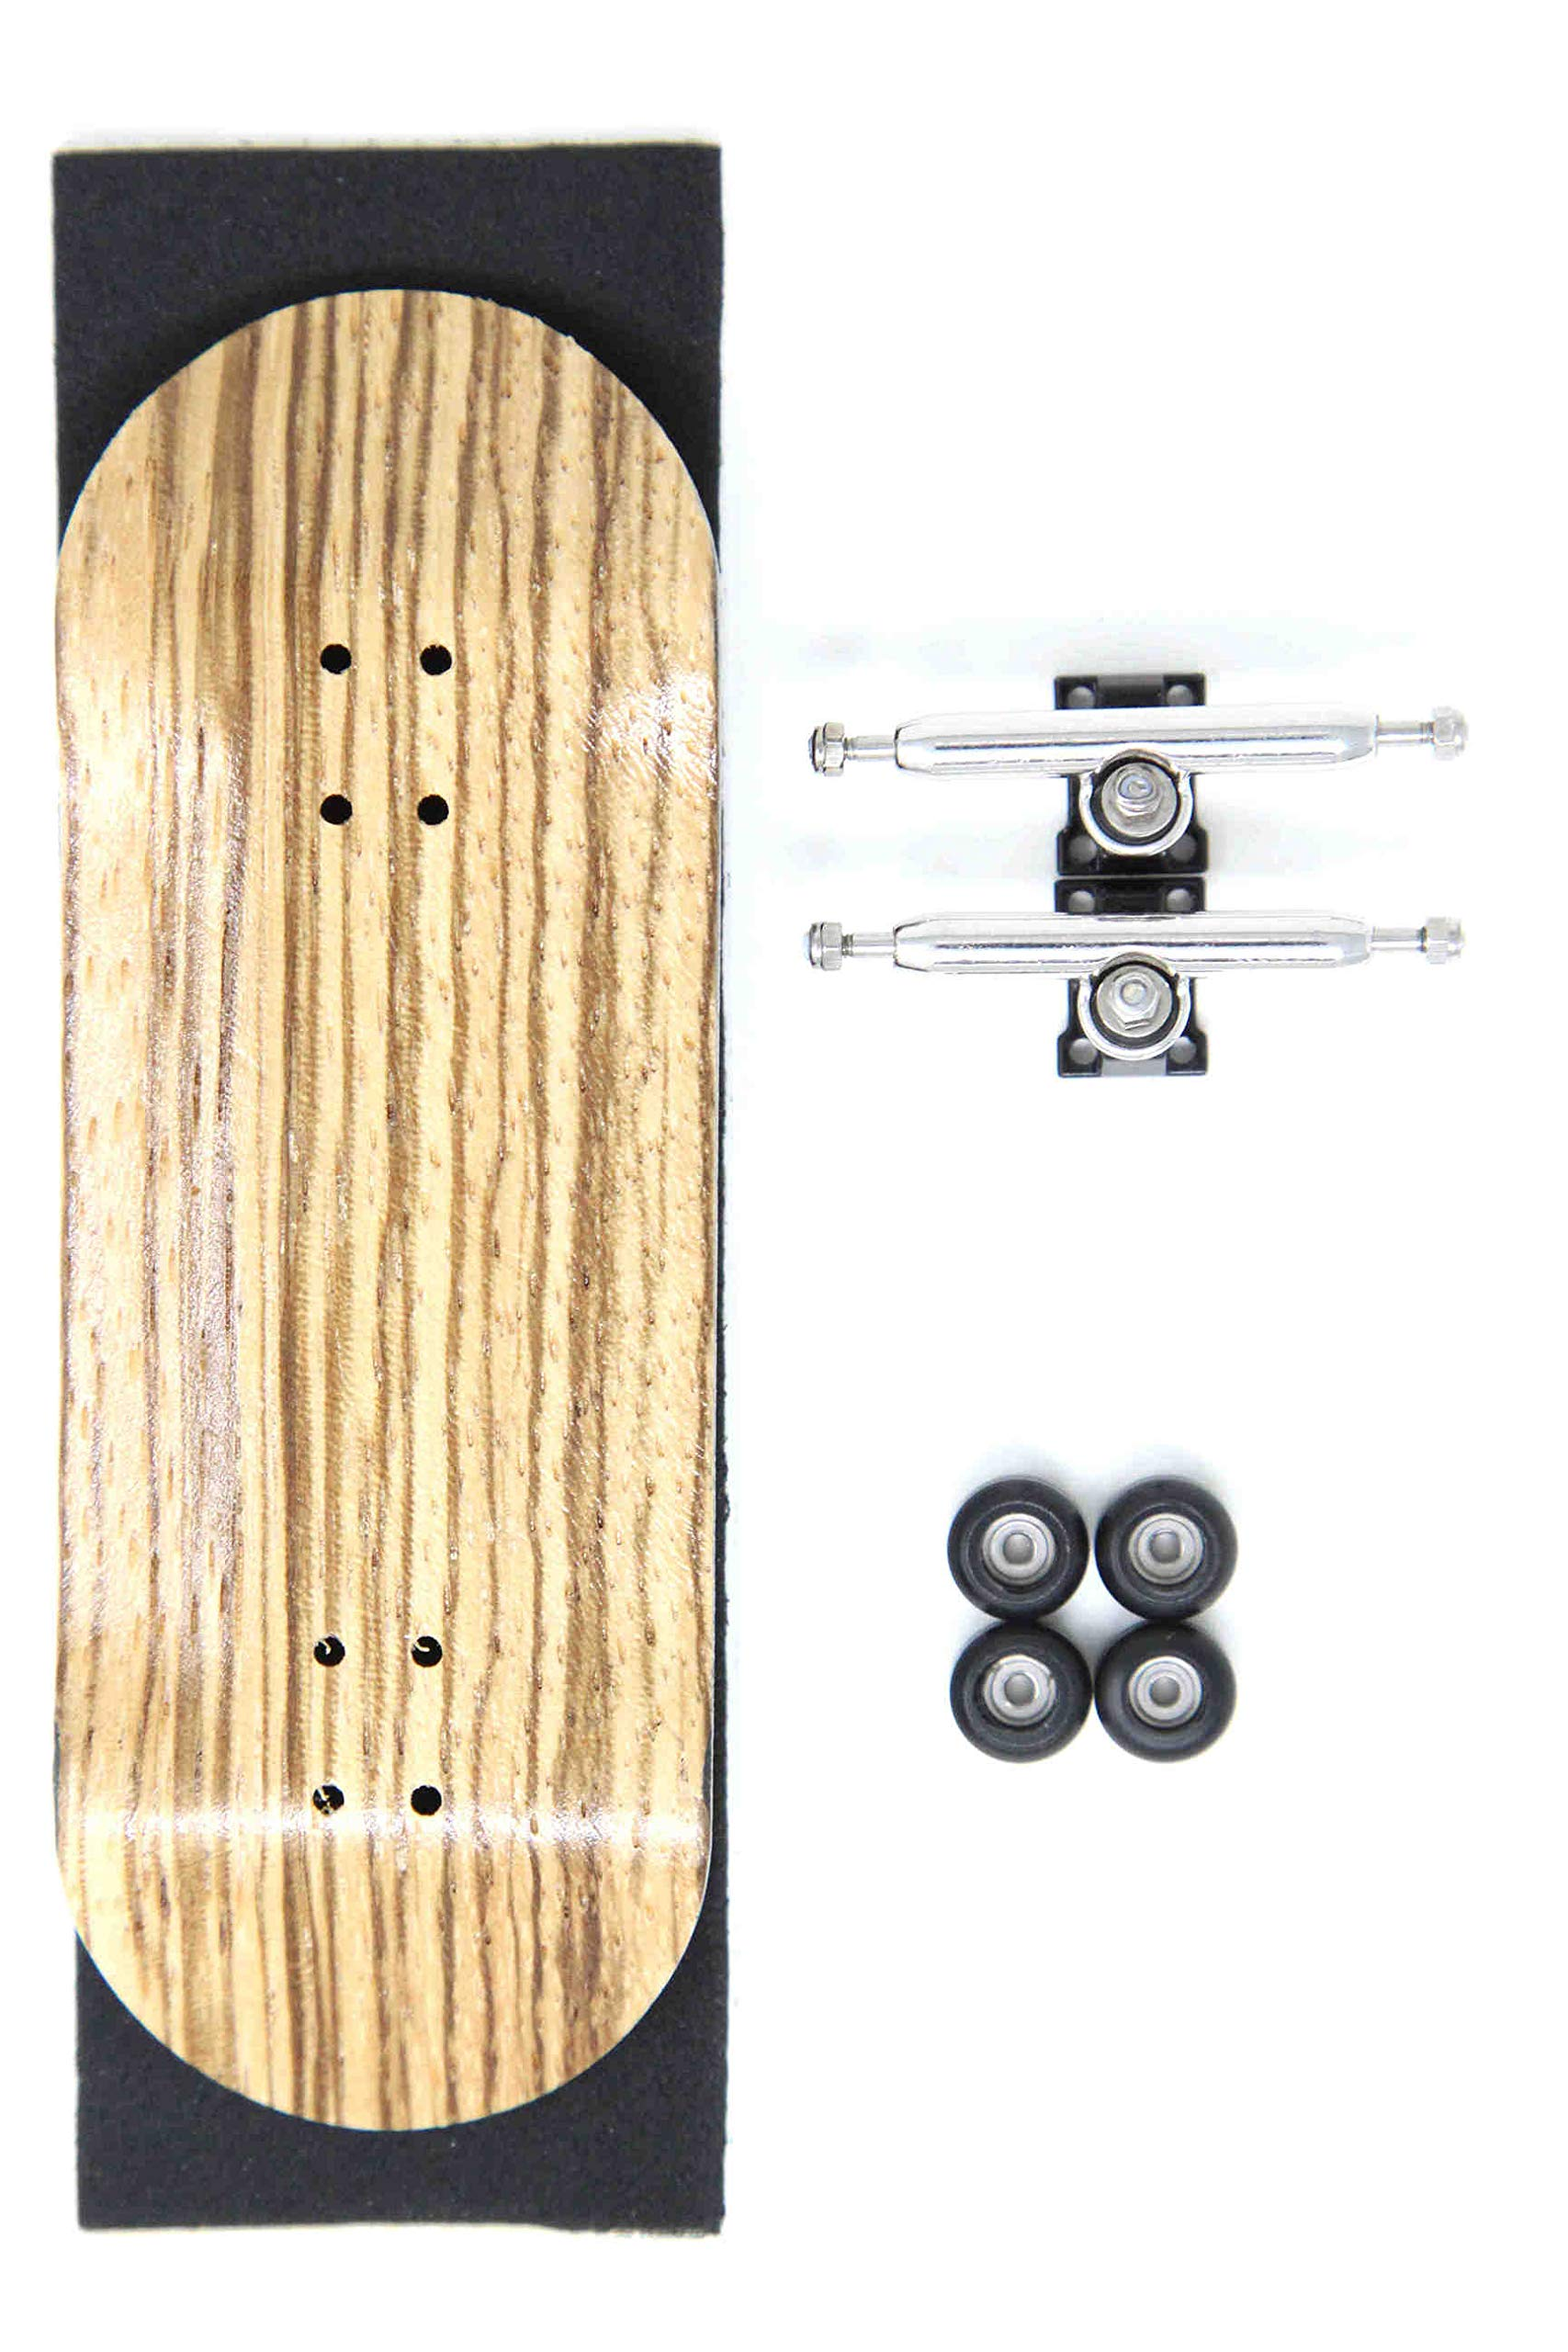 Black//White Skull Fingerboards Urethane Swirl Fingerboard Board Rails